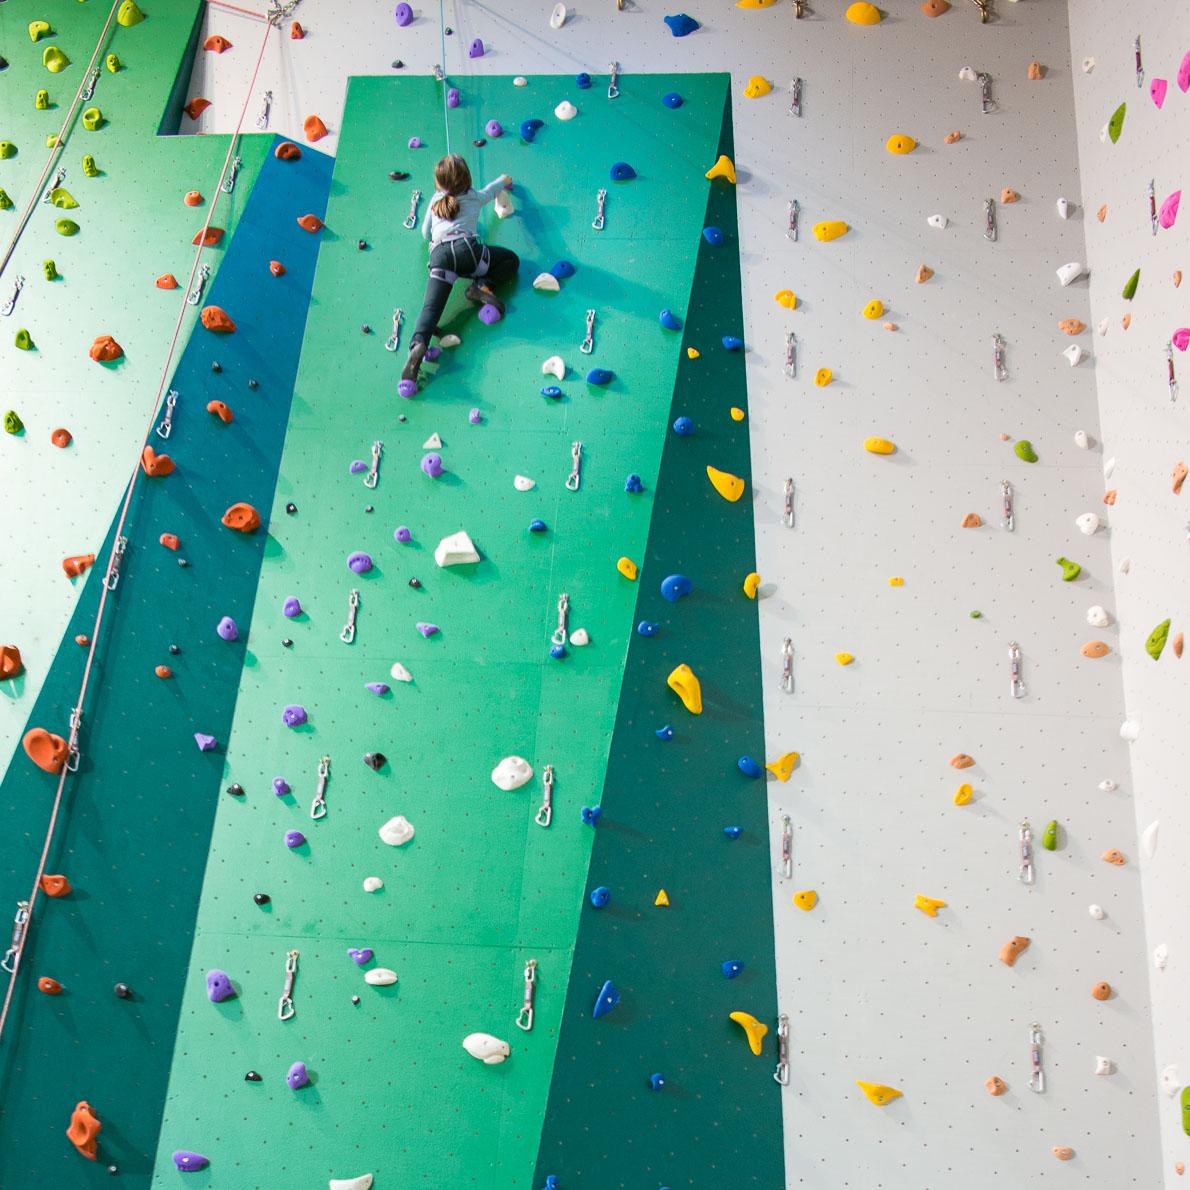 Enfants cours escalade mur megeve escalade meg ve - Mur escalade enfant ...